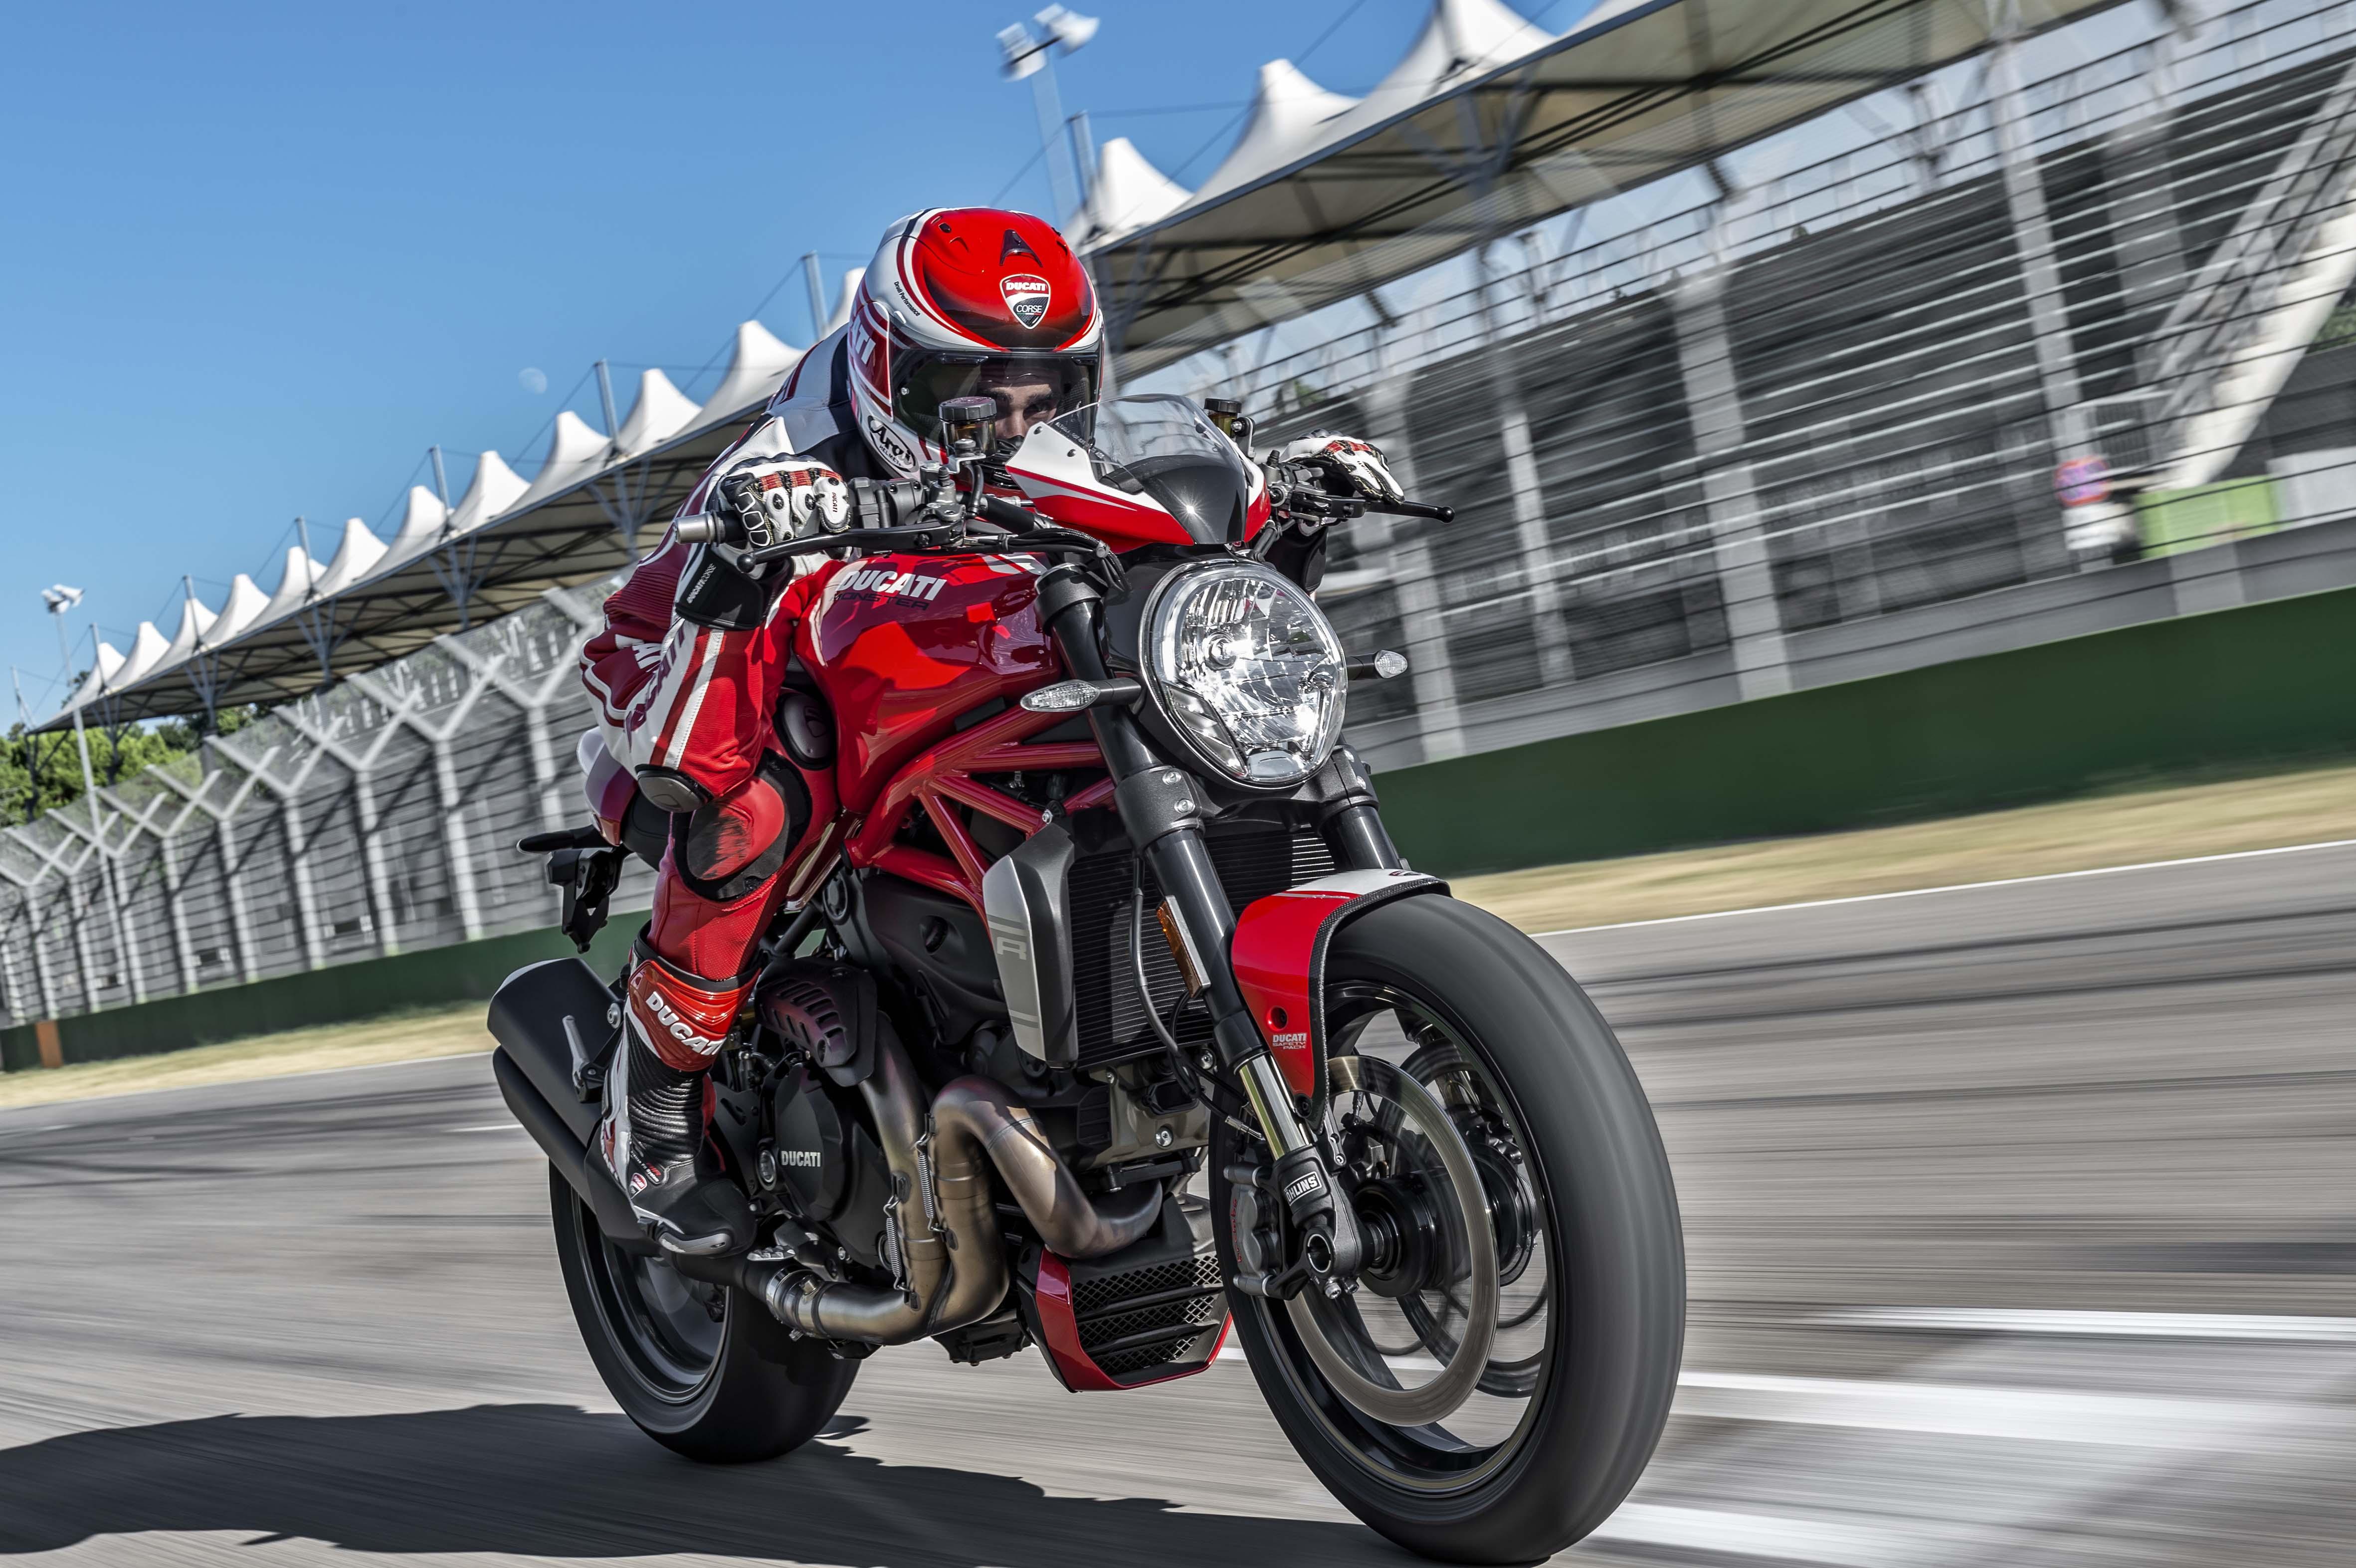 Ducati Monster Price In Malaysia